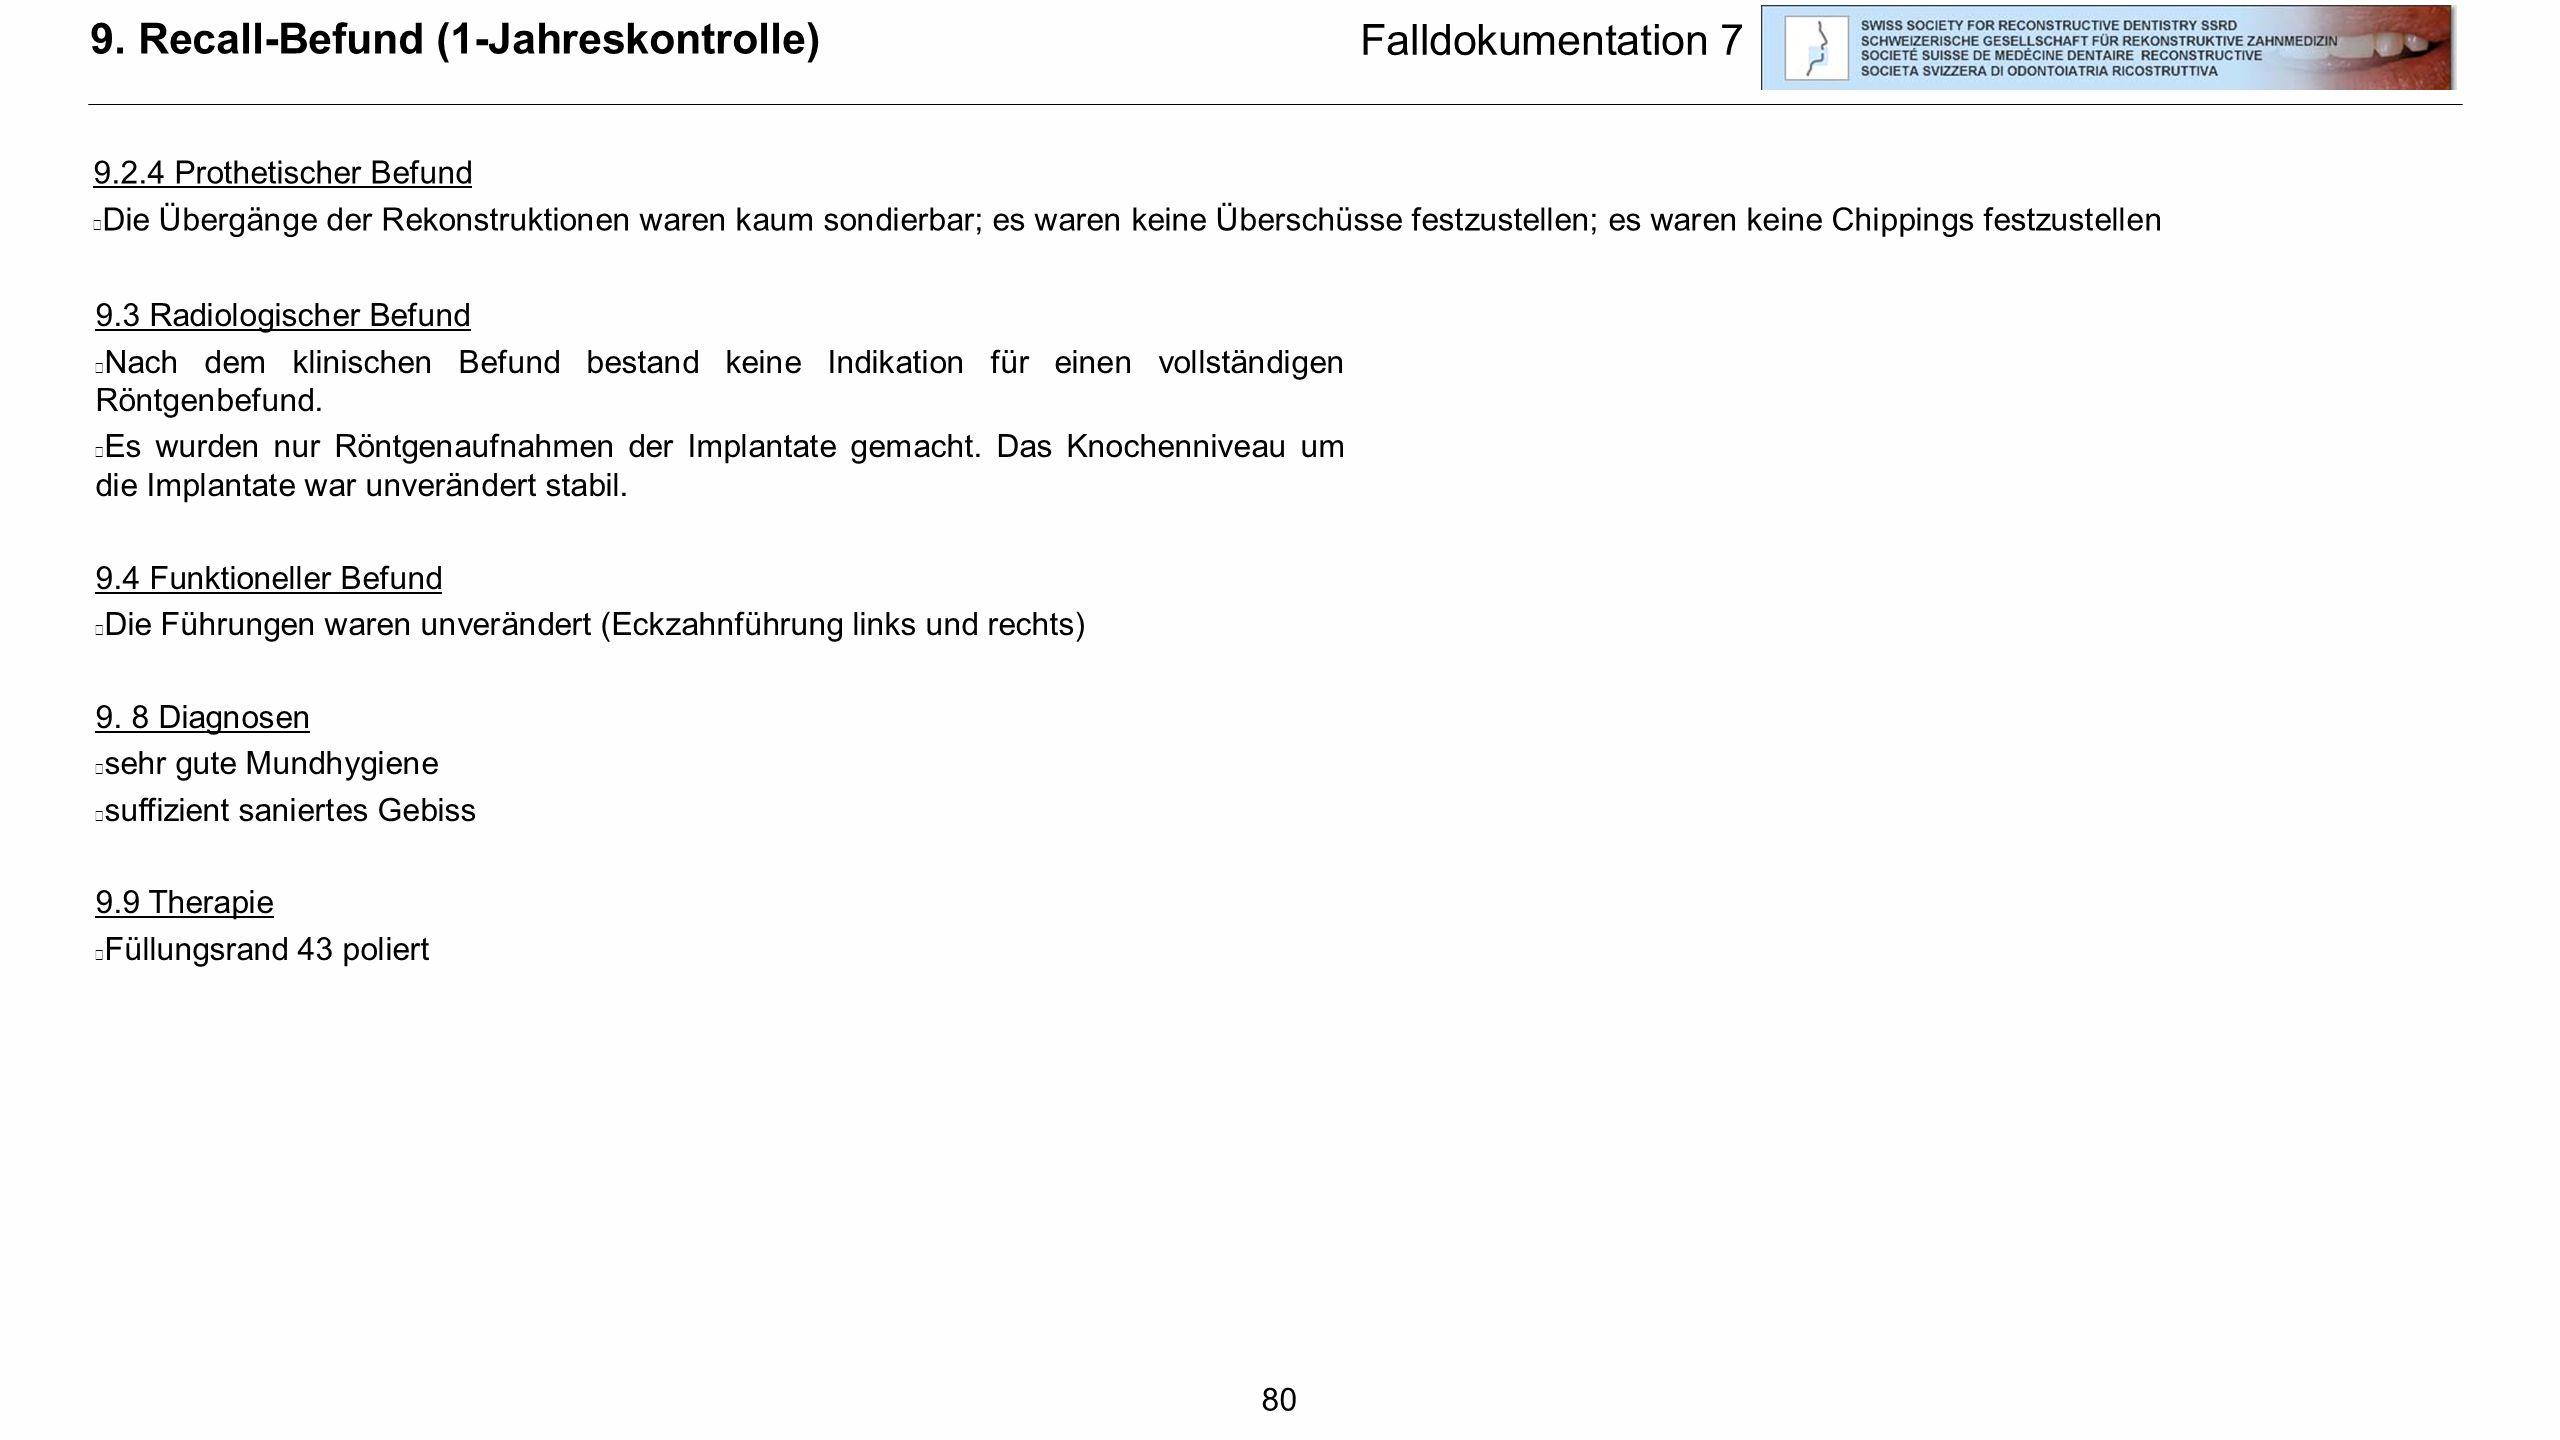 9. Recall-Befund (1-Jahreskontrolle) Falldokumentation 7